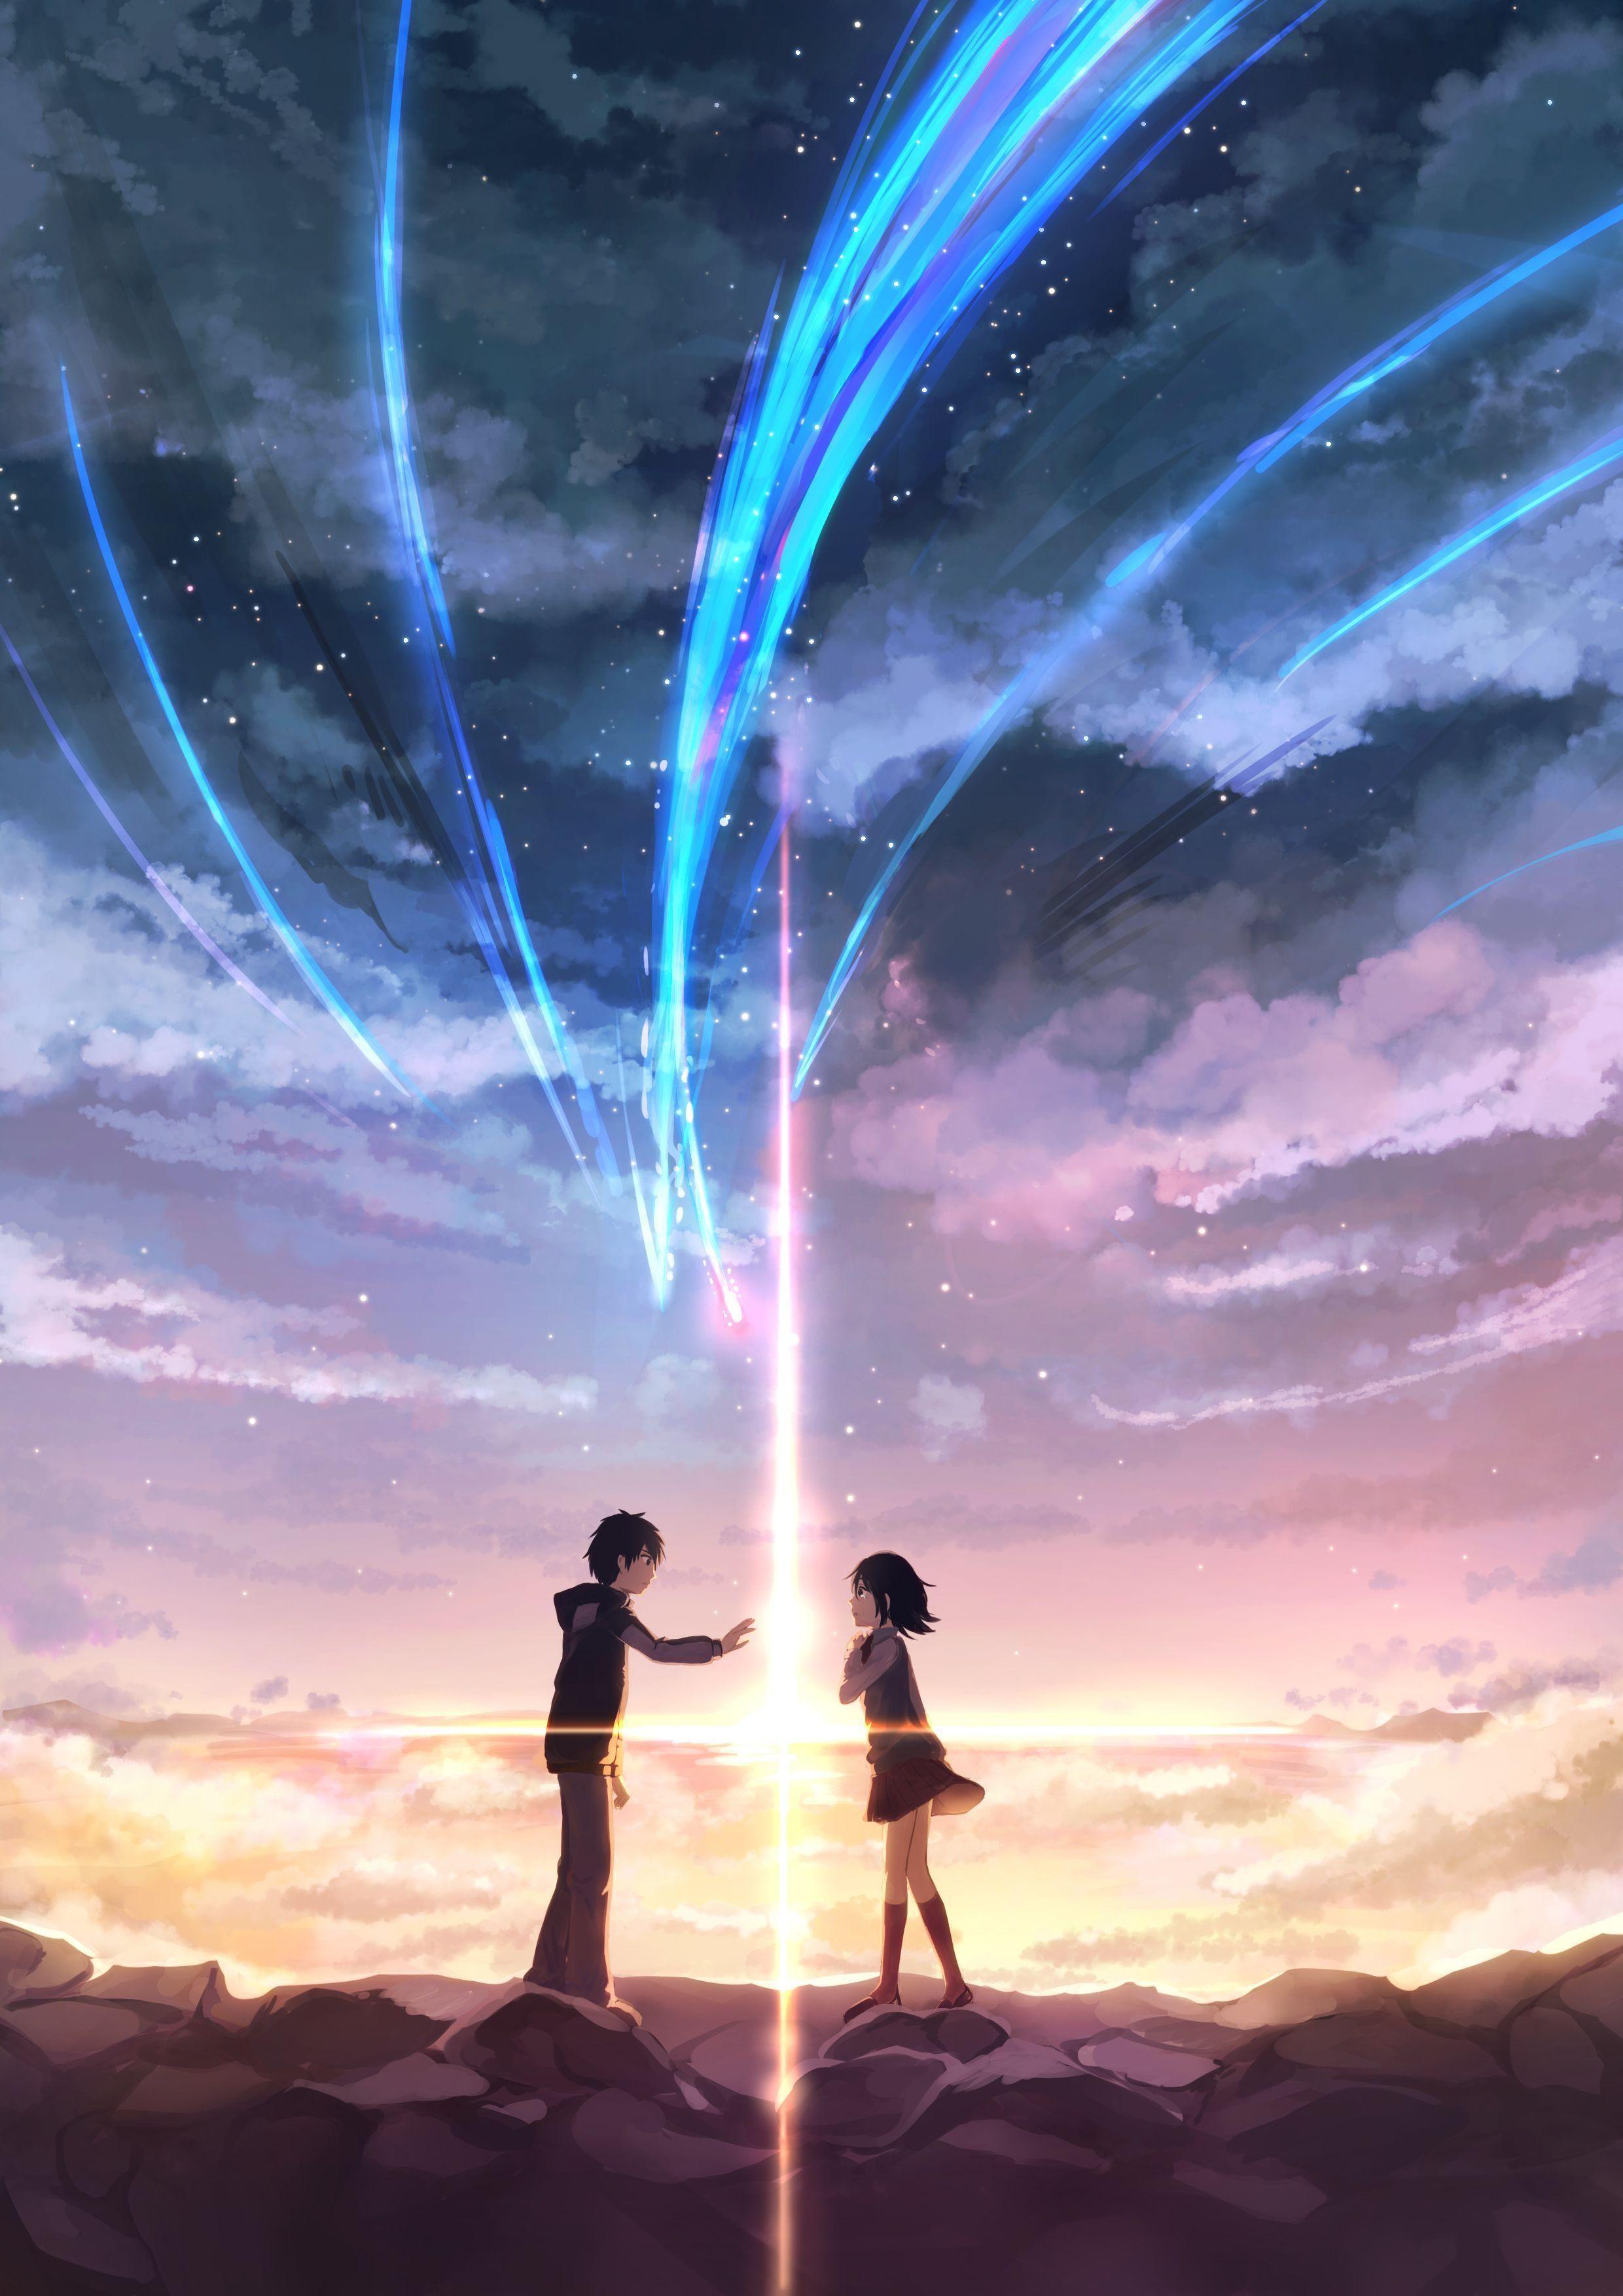 Kimi No Na Wa Wallpapers Wallpaper Cave Your Name Anime Kimi No Na Wa Anime Scenery